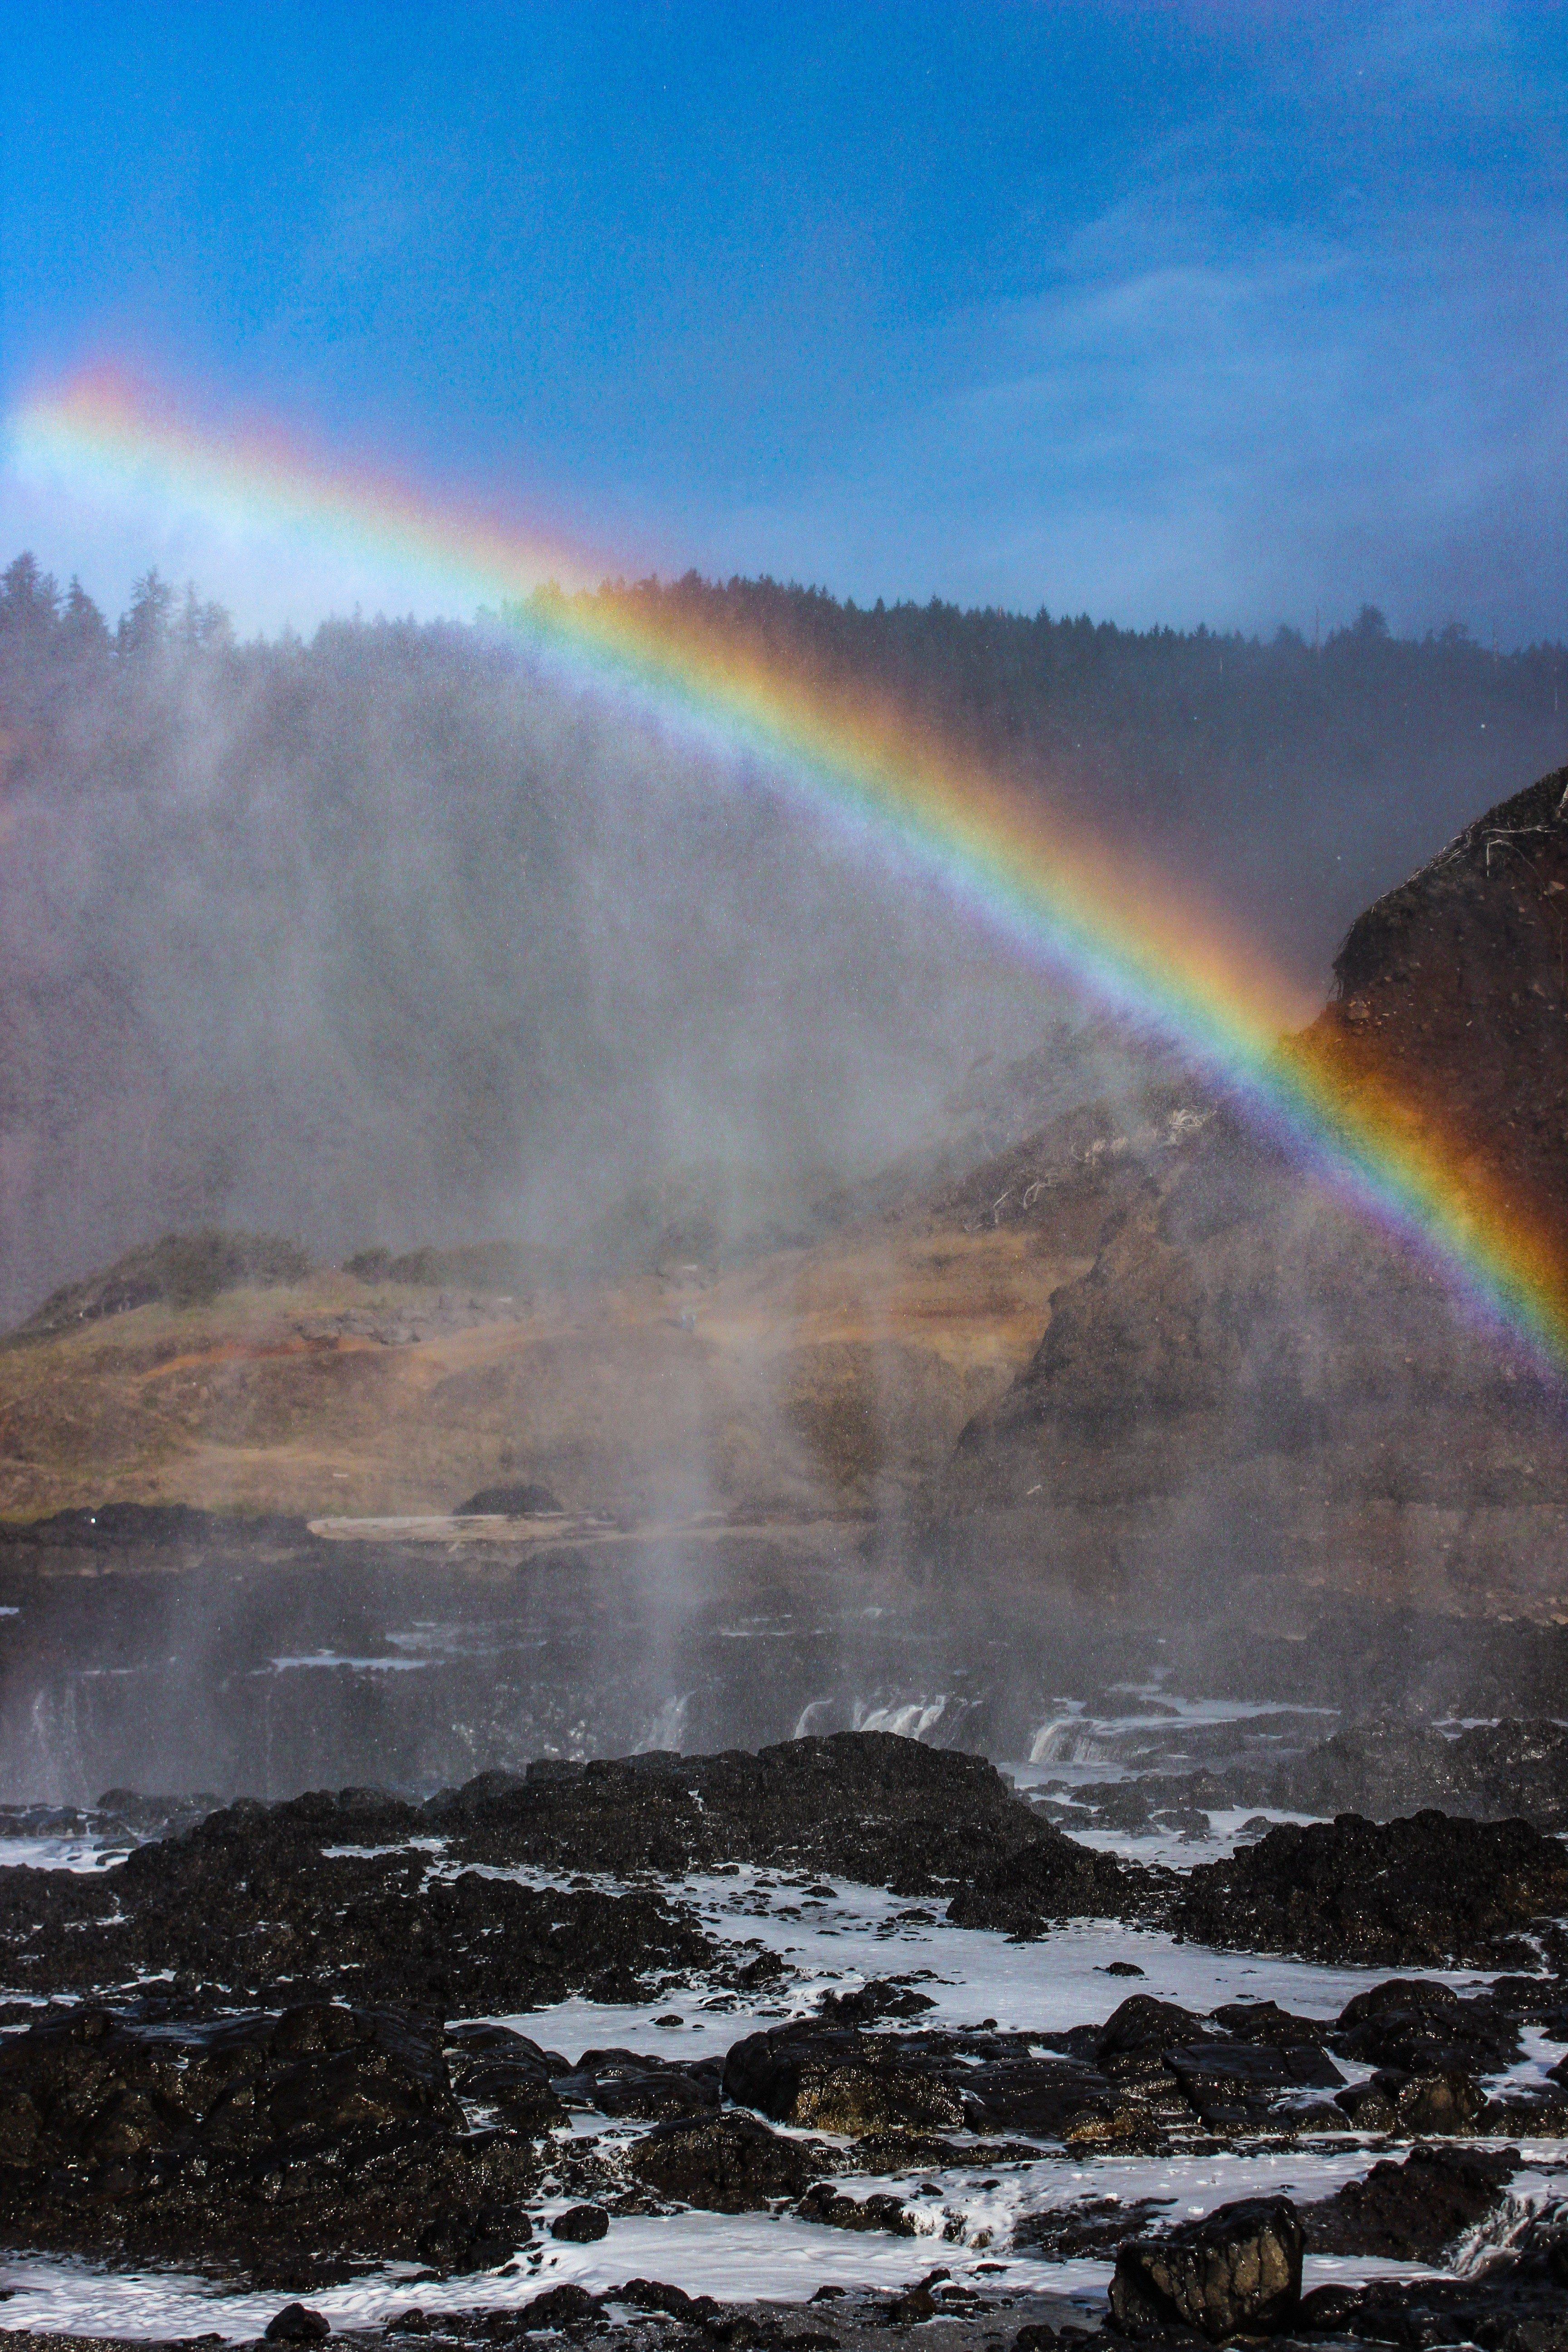 Devil's Punchbowl on the Oregon coast rainbow